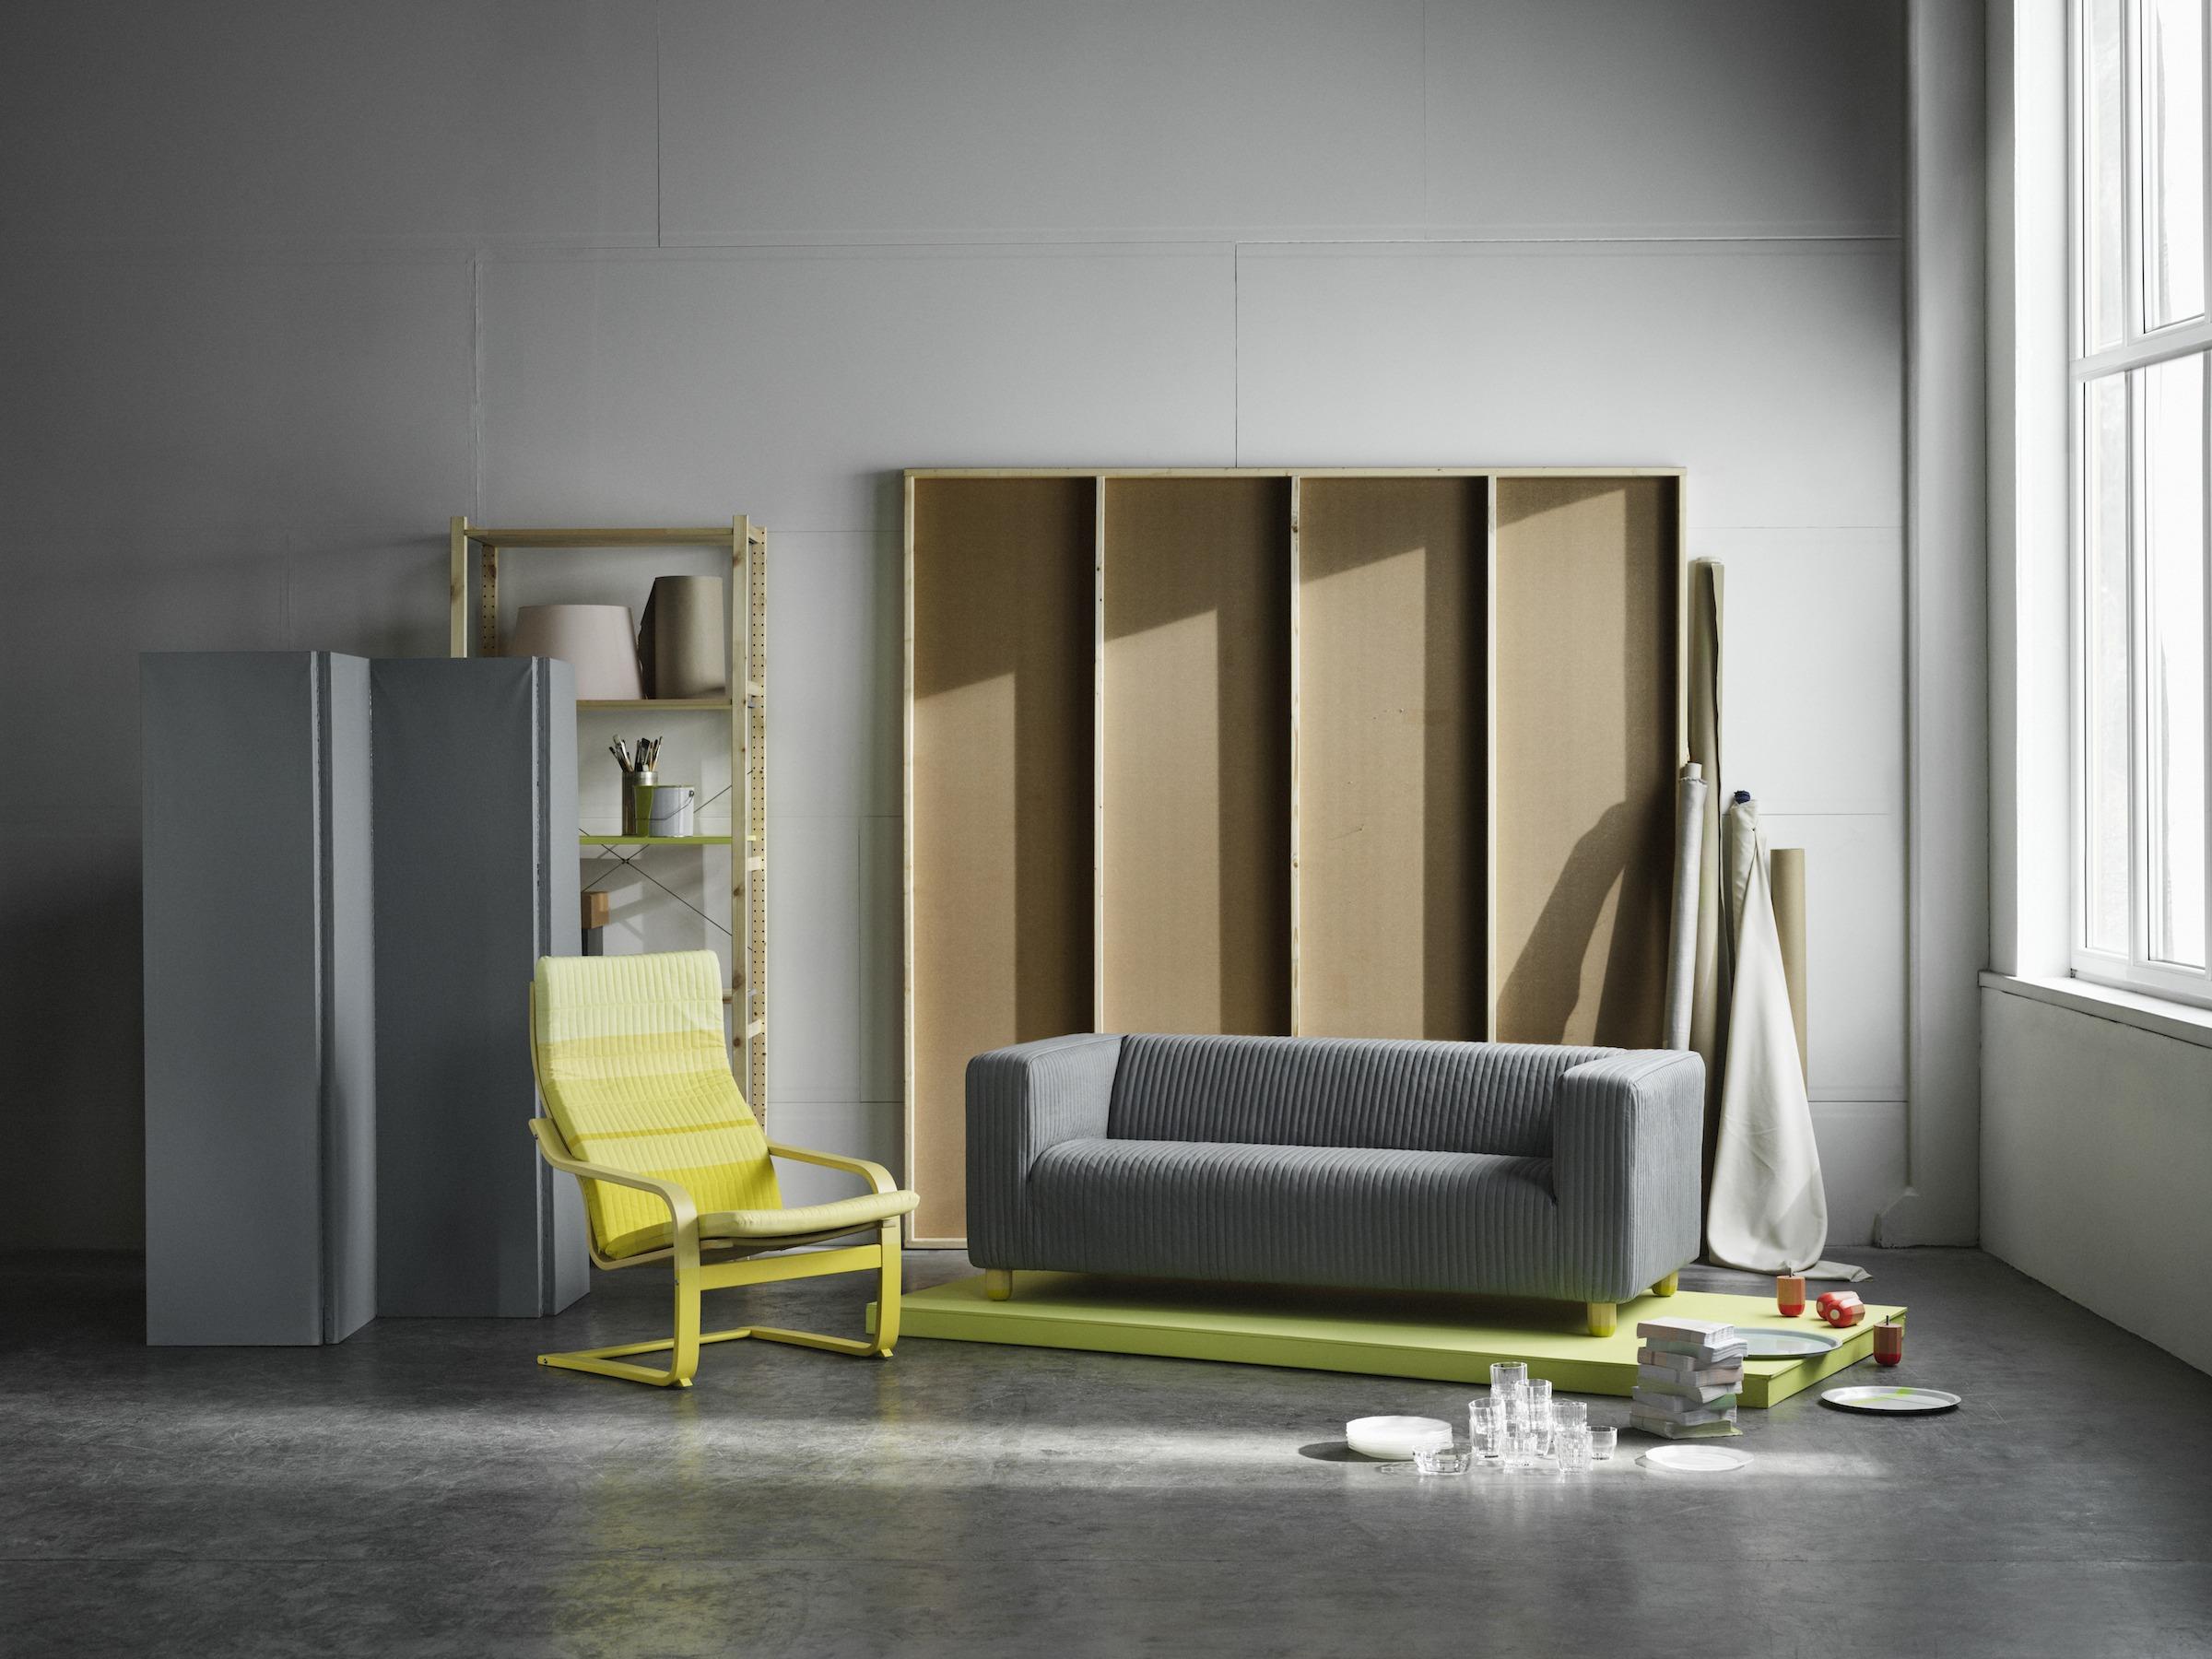 ikea hackable furniture